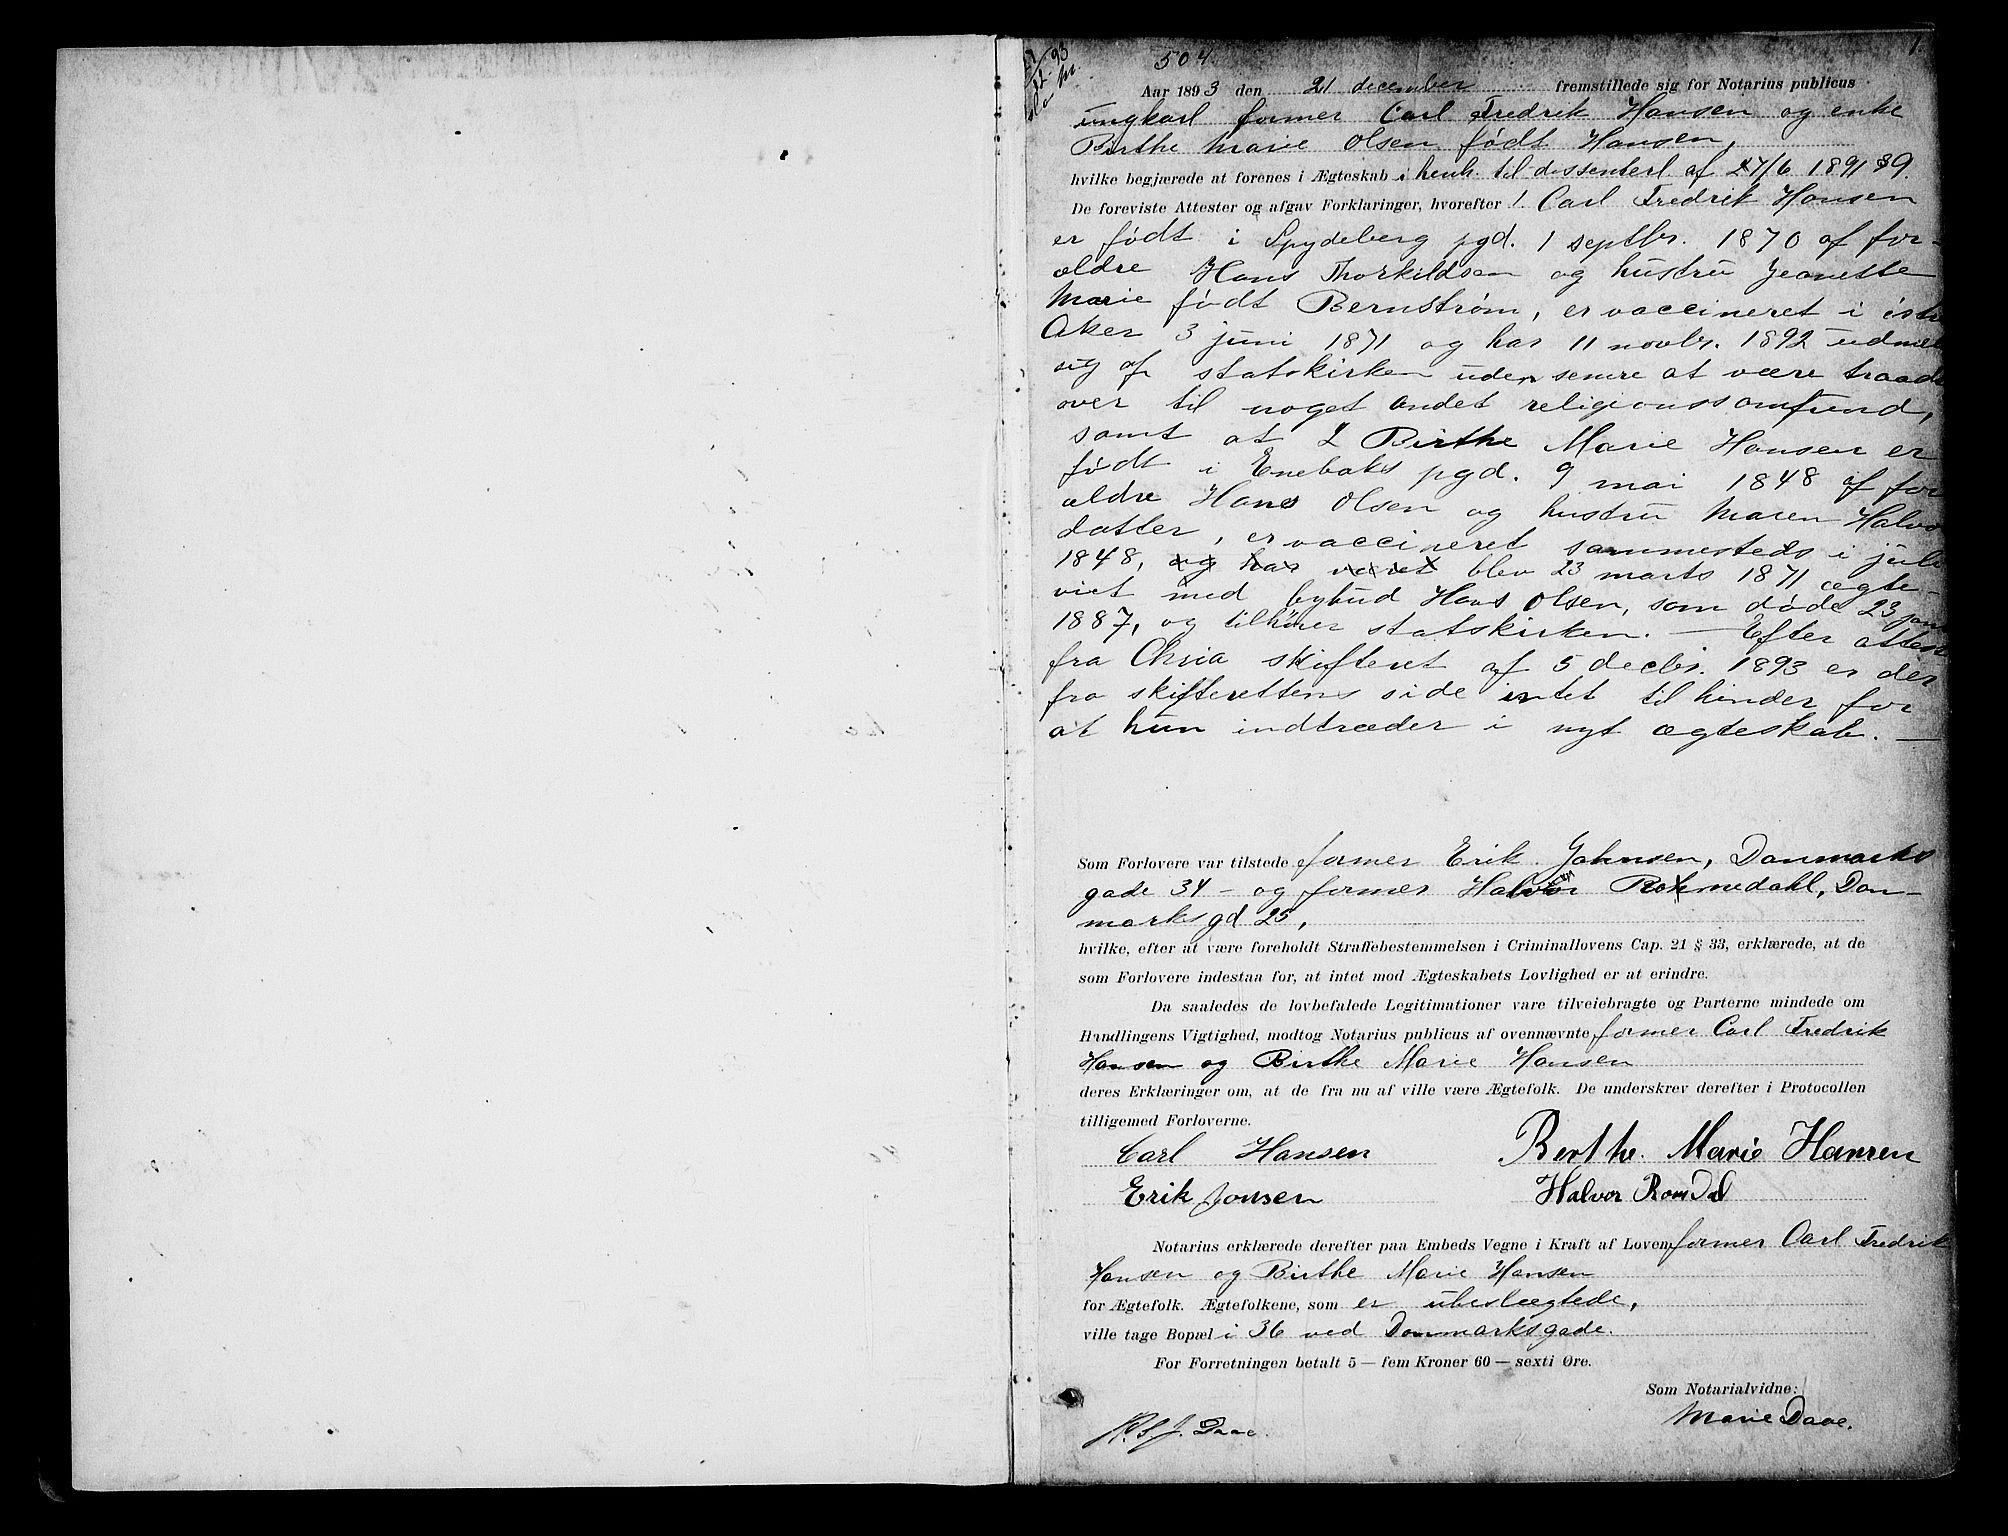 SAO, Oslo byfogd avd. I, L/Lb/Lbb/L0002: Notarialprotokoll, rekke II: Vigsler, 1893-1897, s. 1a